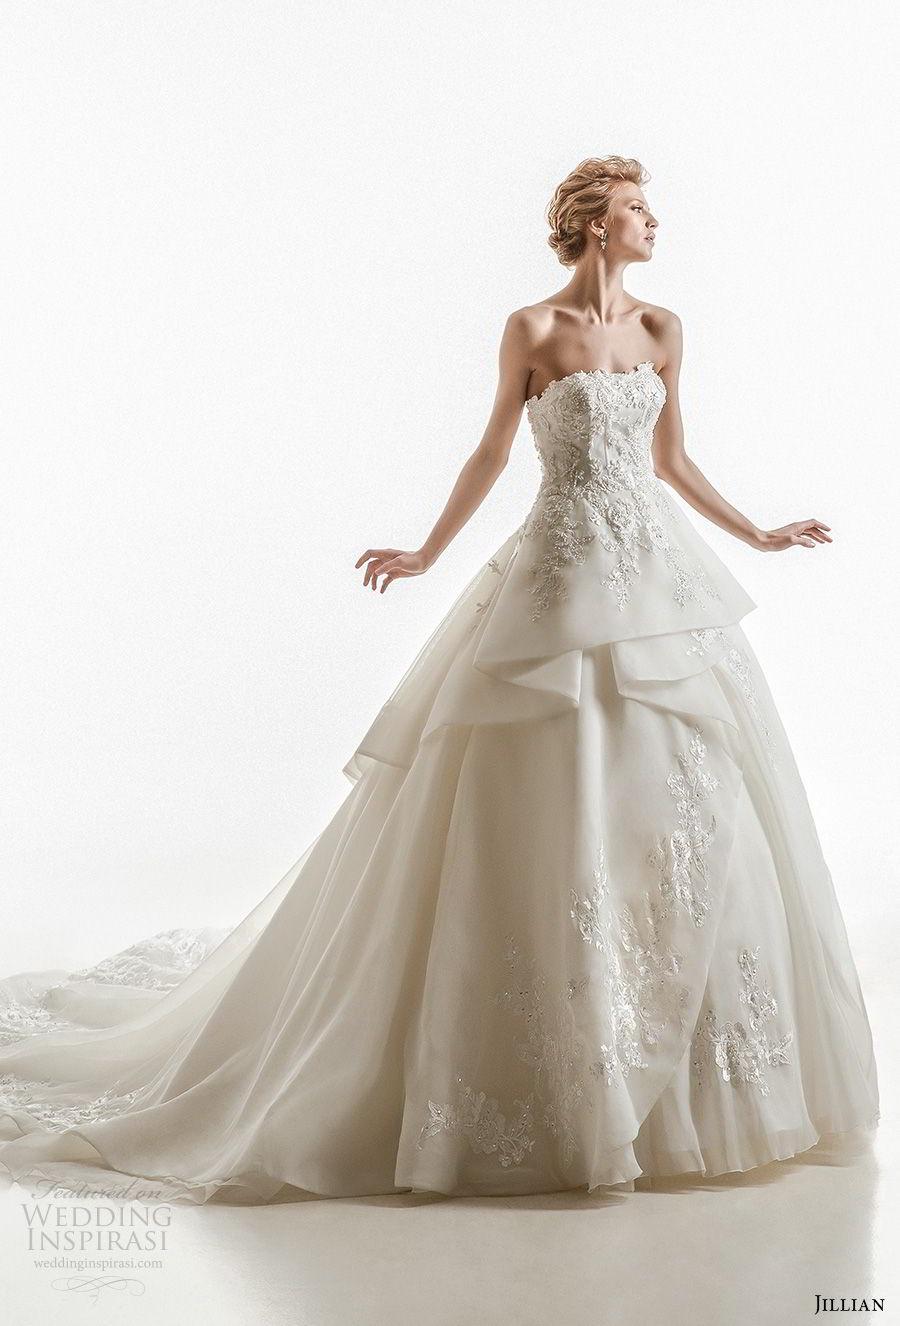 jillian 2018 bridal strapless straight across neckline heavily embellished bodice peplum princess ball gown wedding dress royal train (18) mv